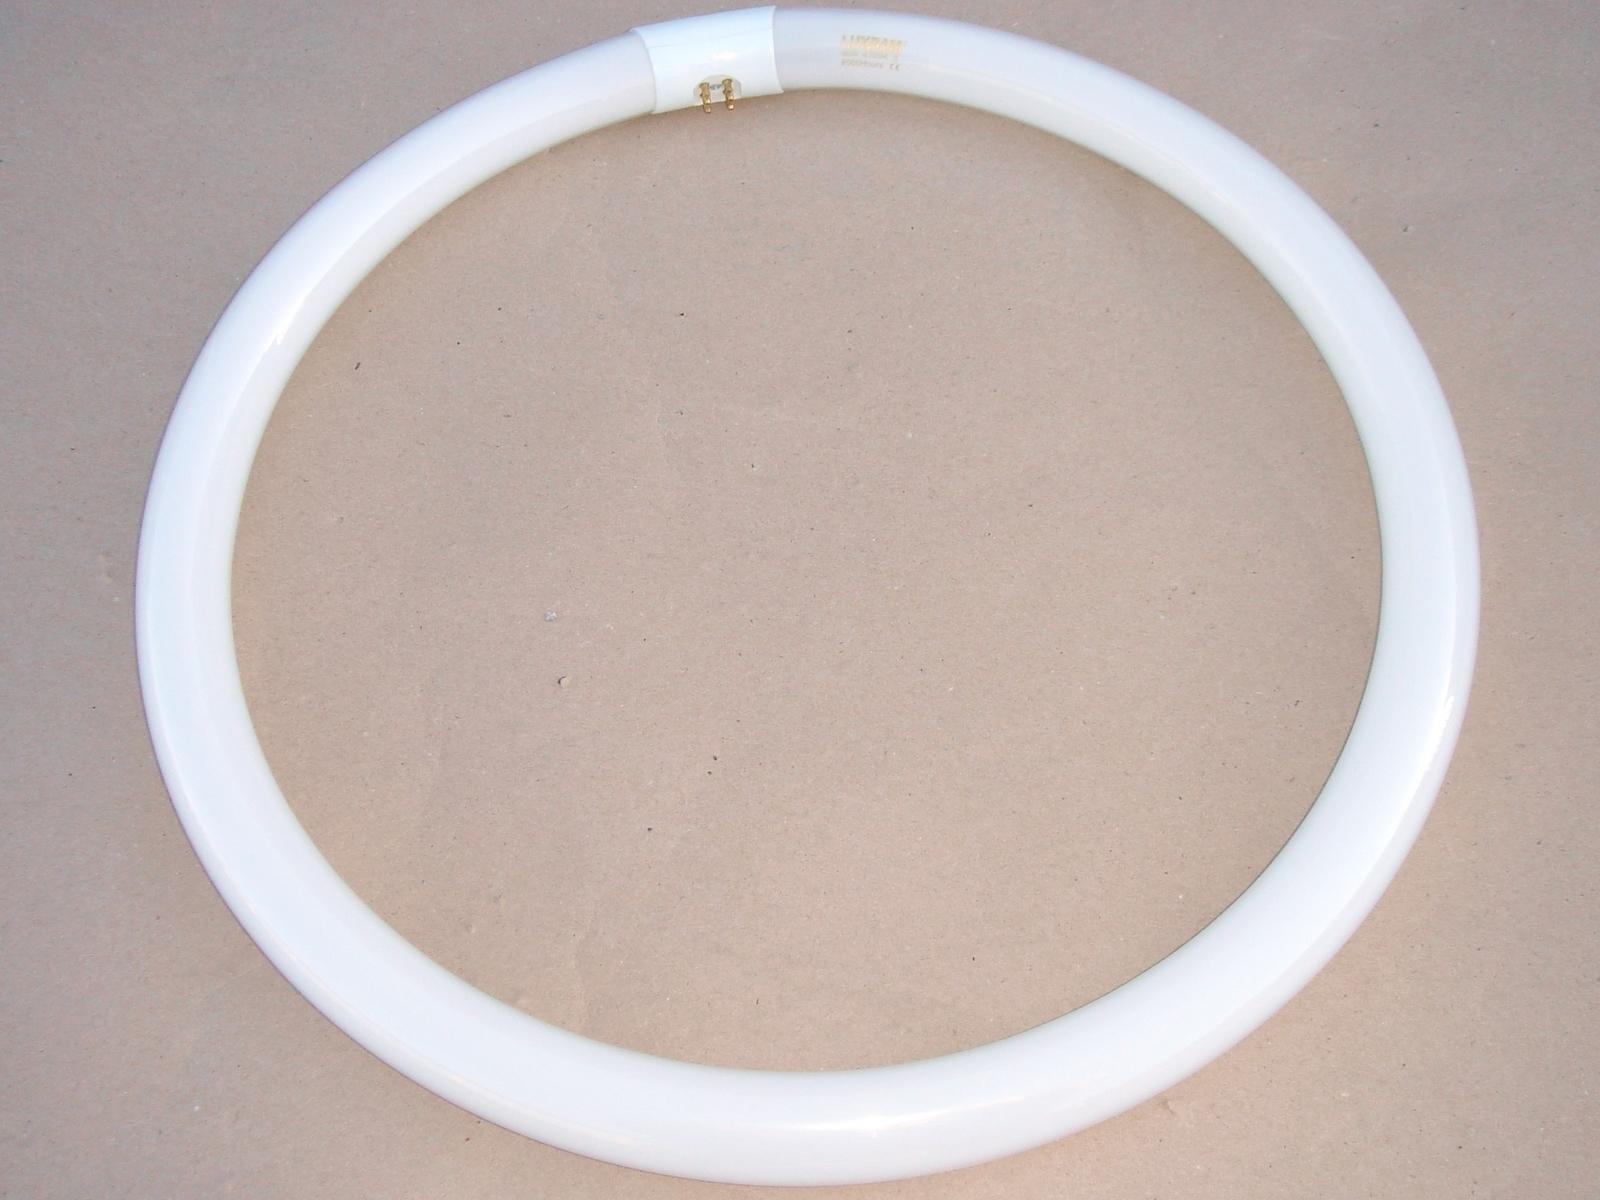 Rõngaslamp 40 W, Luxram, 40W/G10q,  4-PIN , 348010040